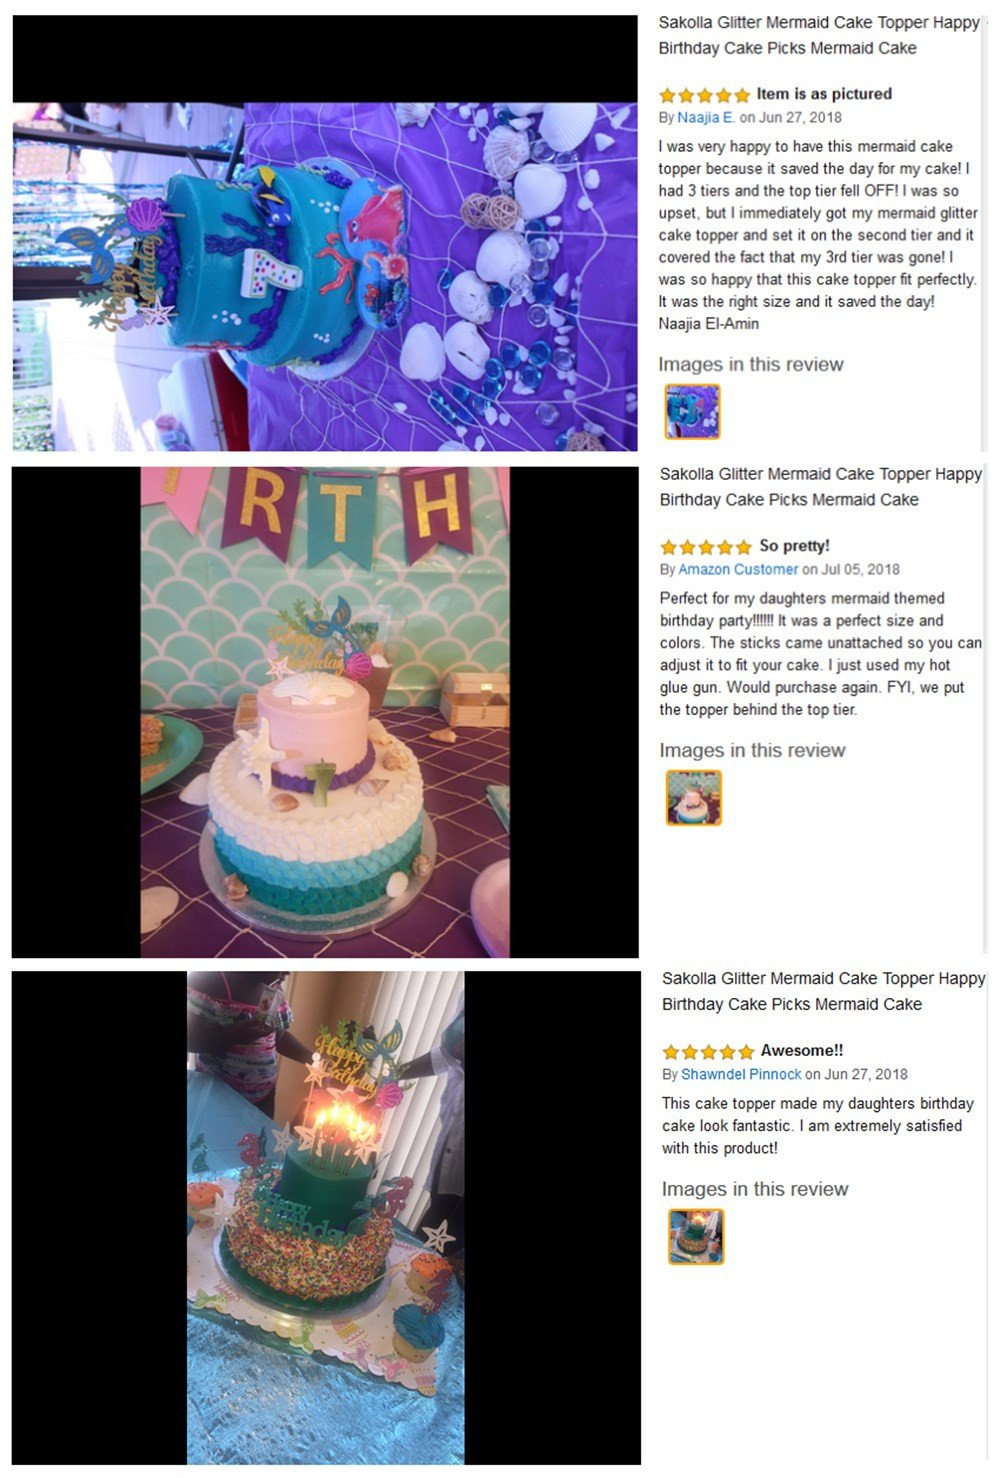 Sakolla Glitter Mermaid Cake Topper Happy Birthday Cake Picks